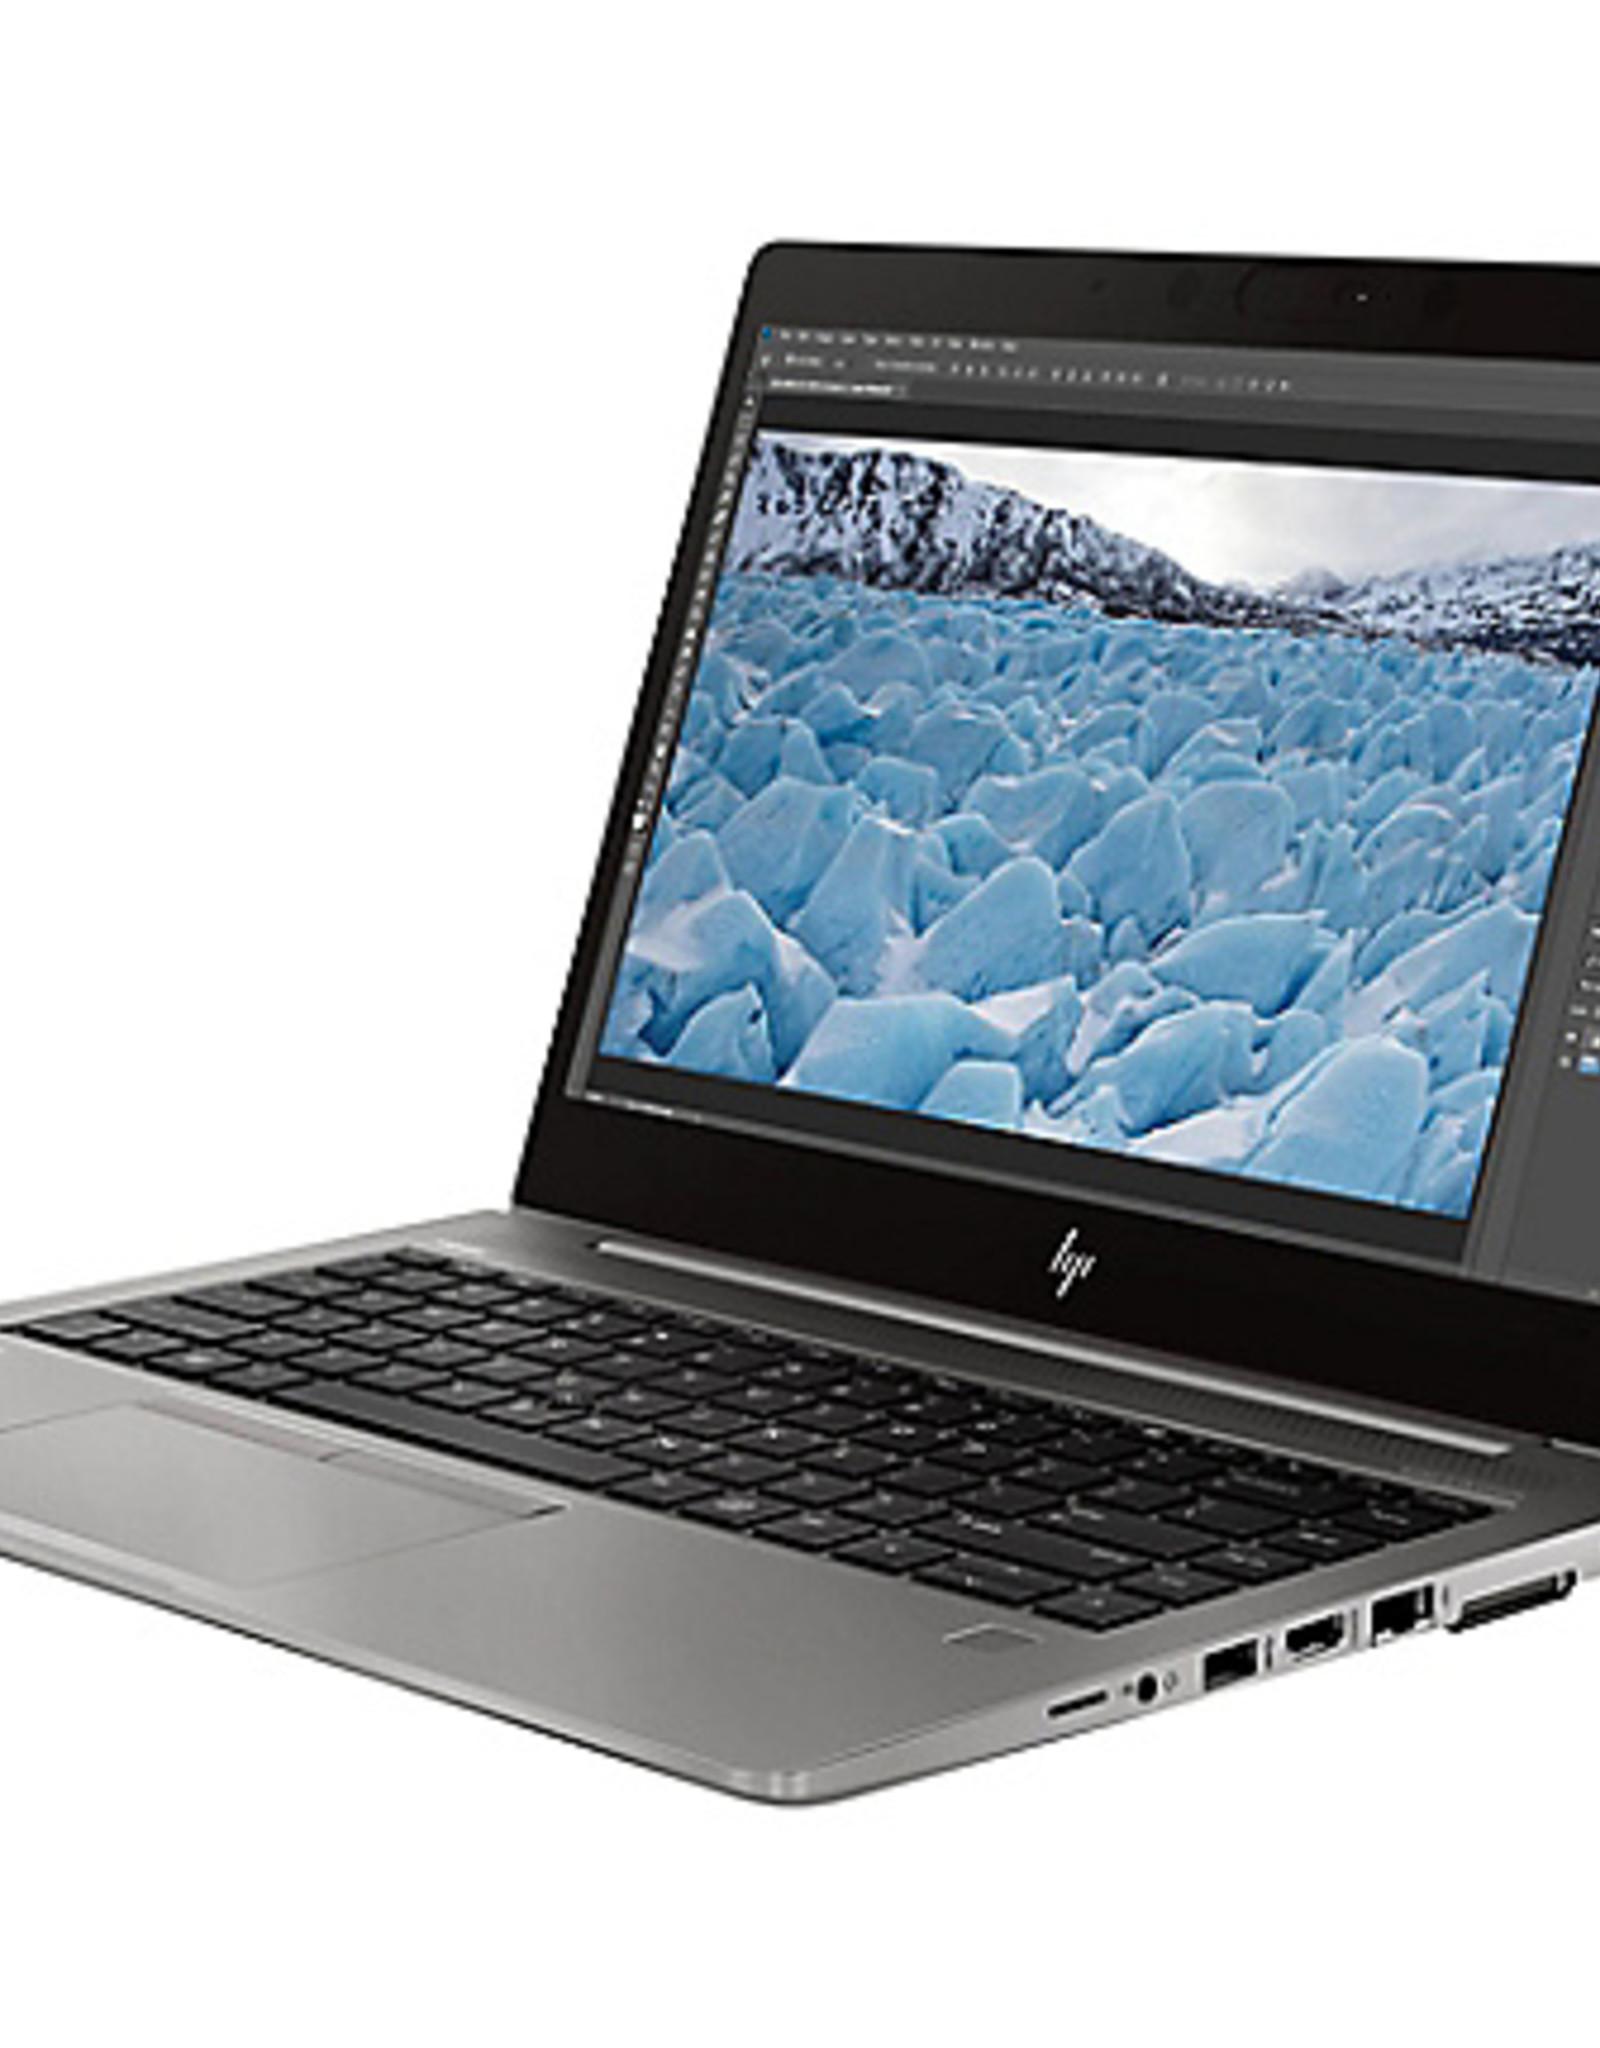 HP ZBOOK 14U G6 I5 8265U/8GB/256SSD/14 FHD NON-TOUCH/4YR ADP